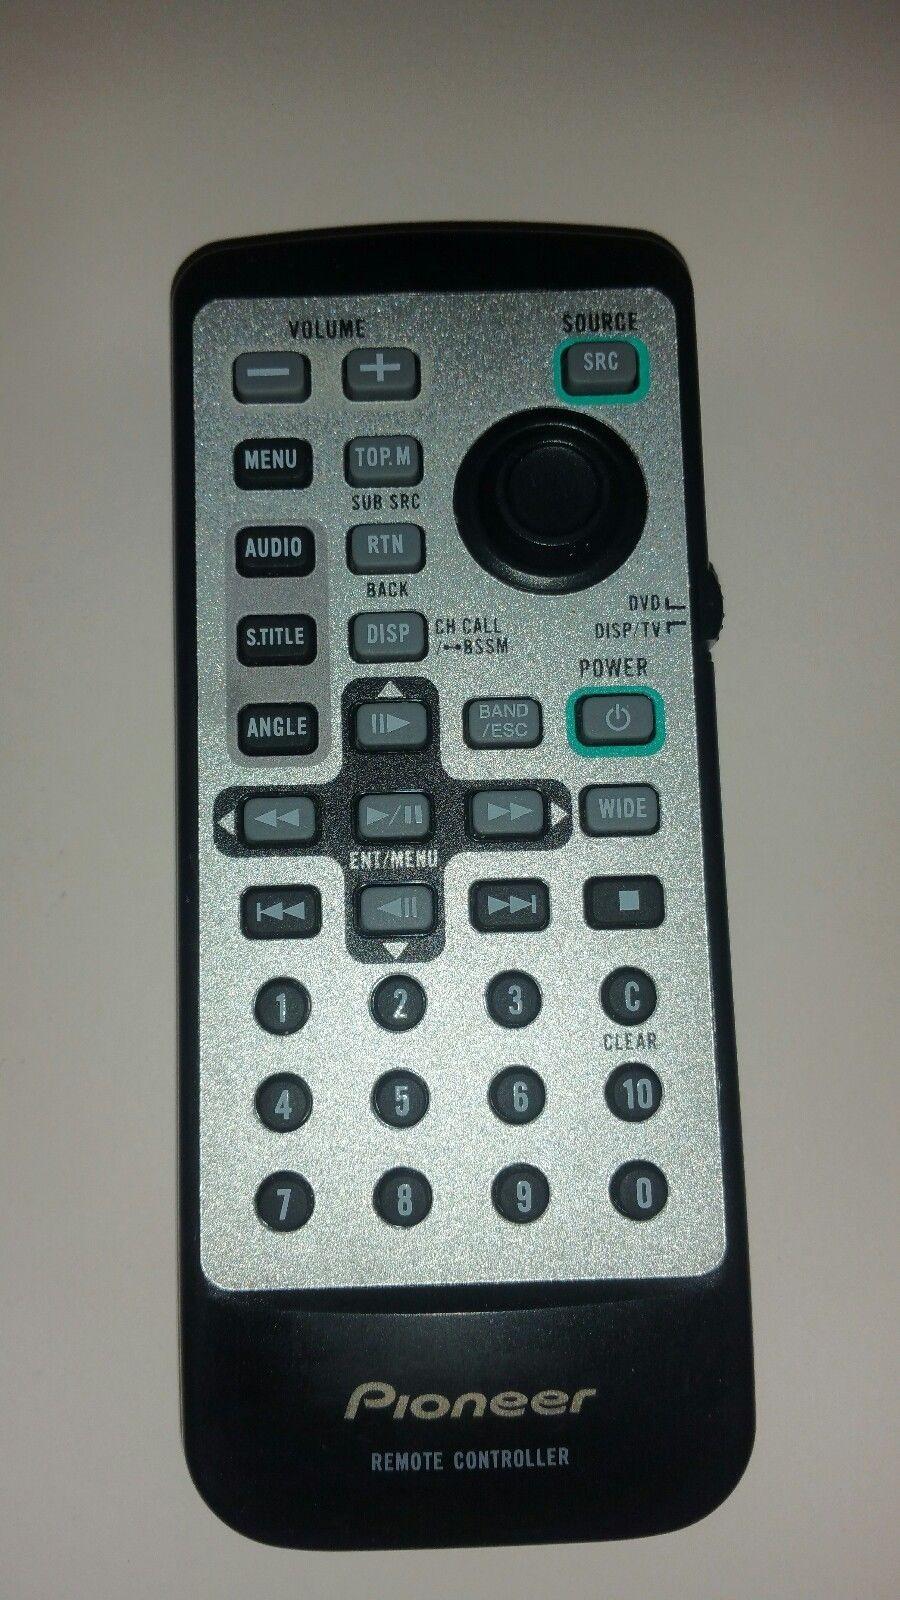 0 0-81-Original Used Authentic Refurbished OEM  Remote Control Genuine PIONEER CXB9056-image